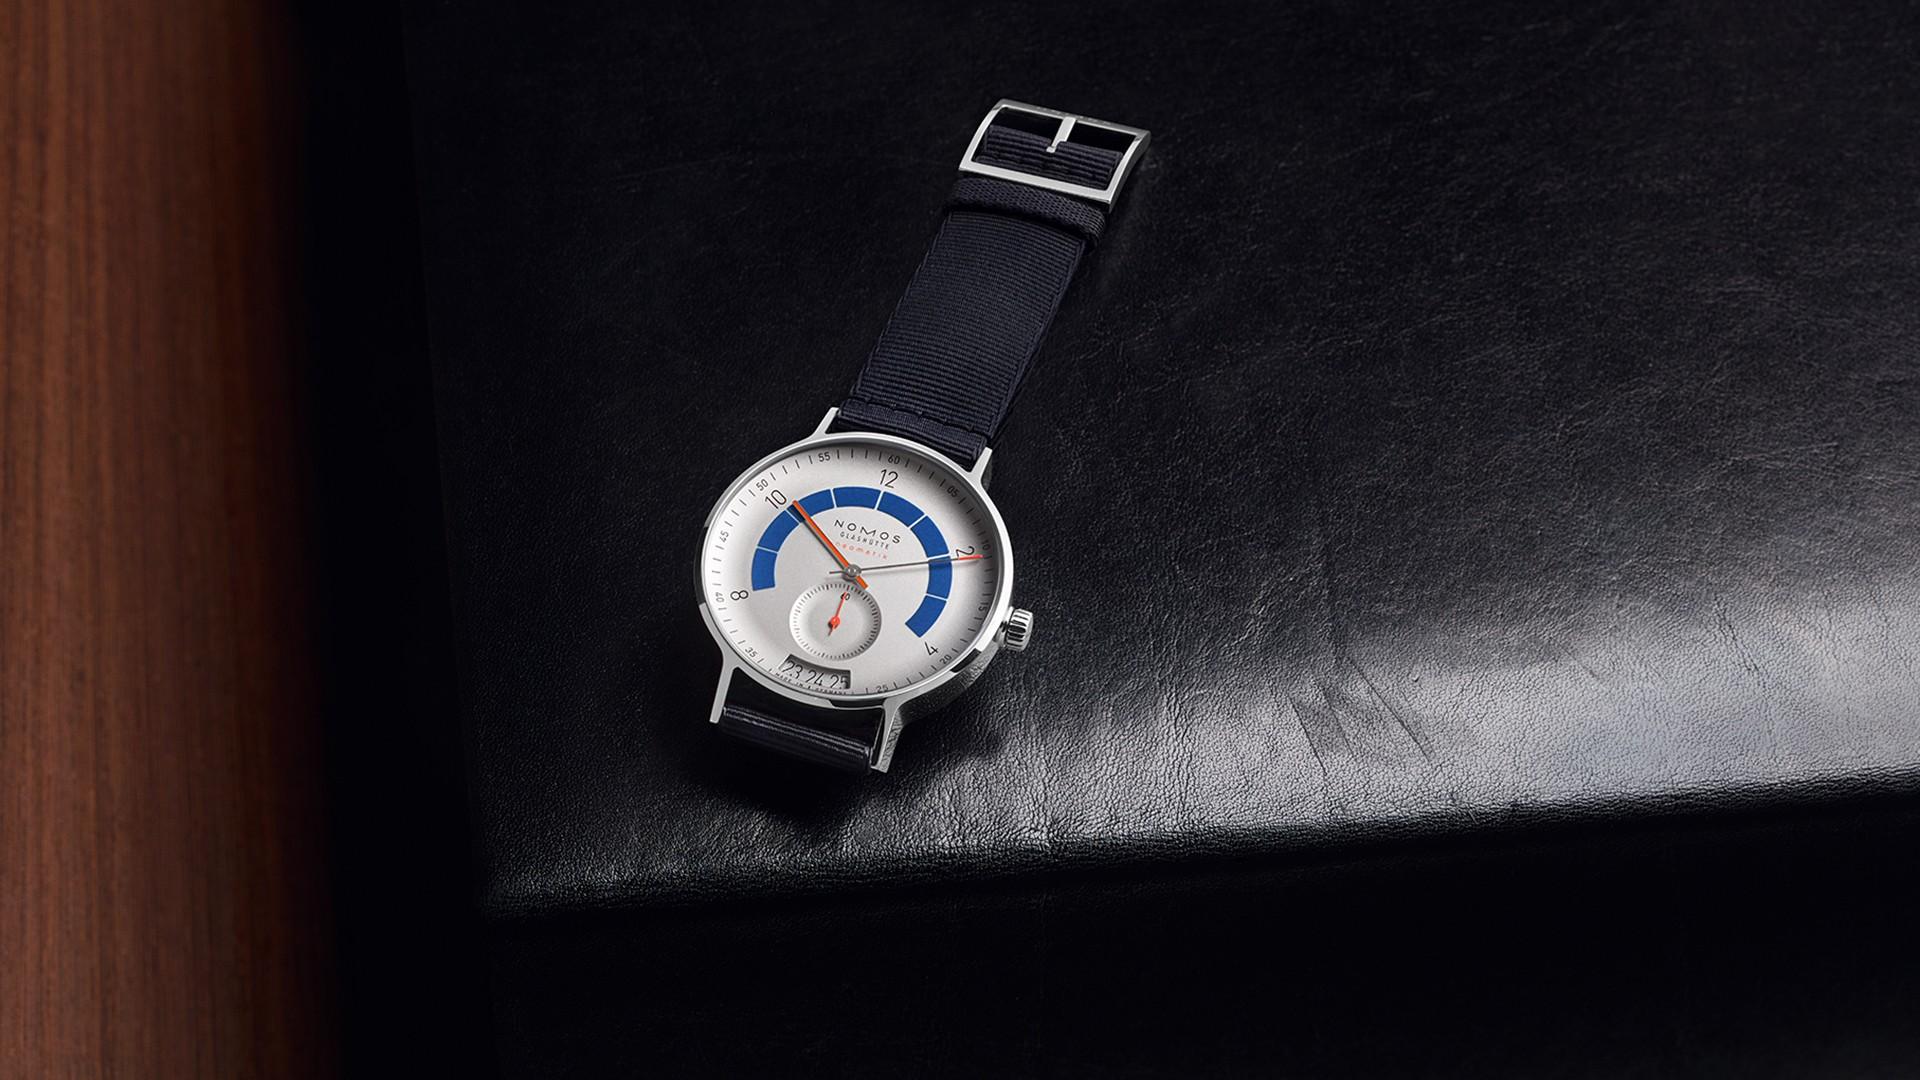 Nomos Glashütte Autobahn watch Baselworld 2018